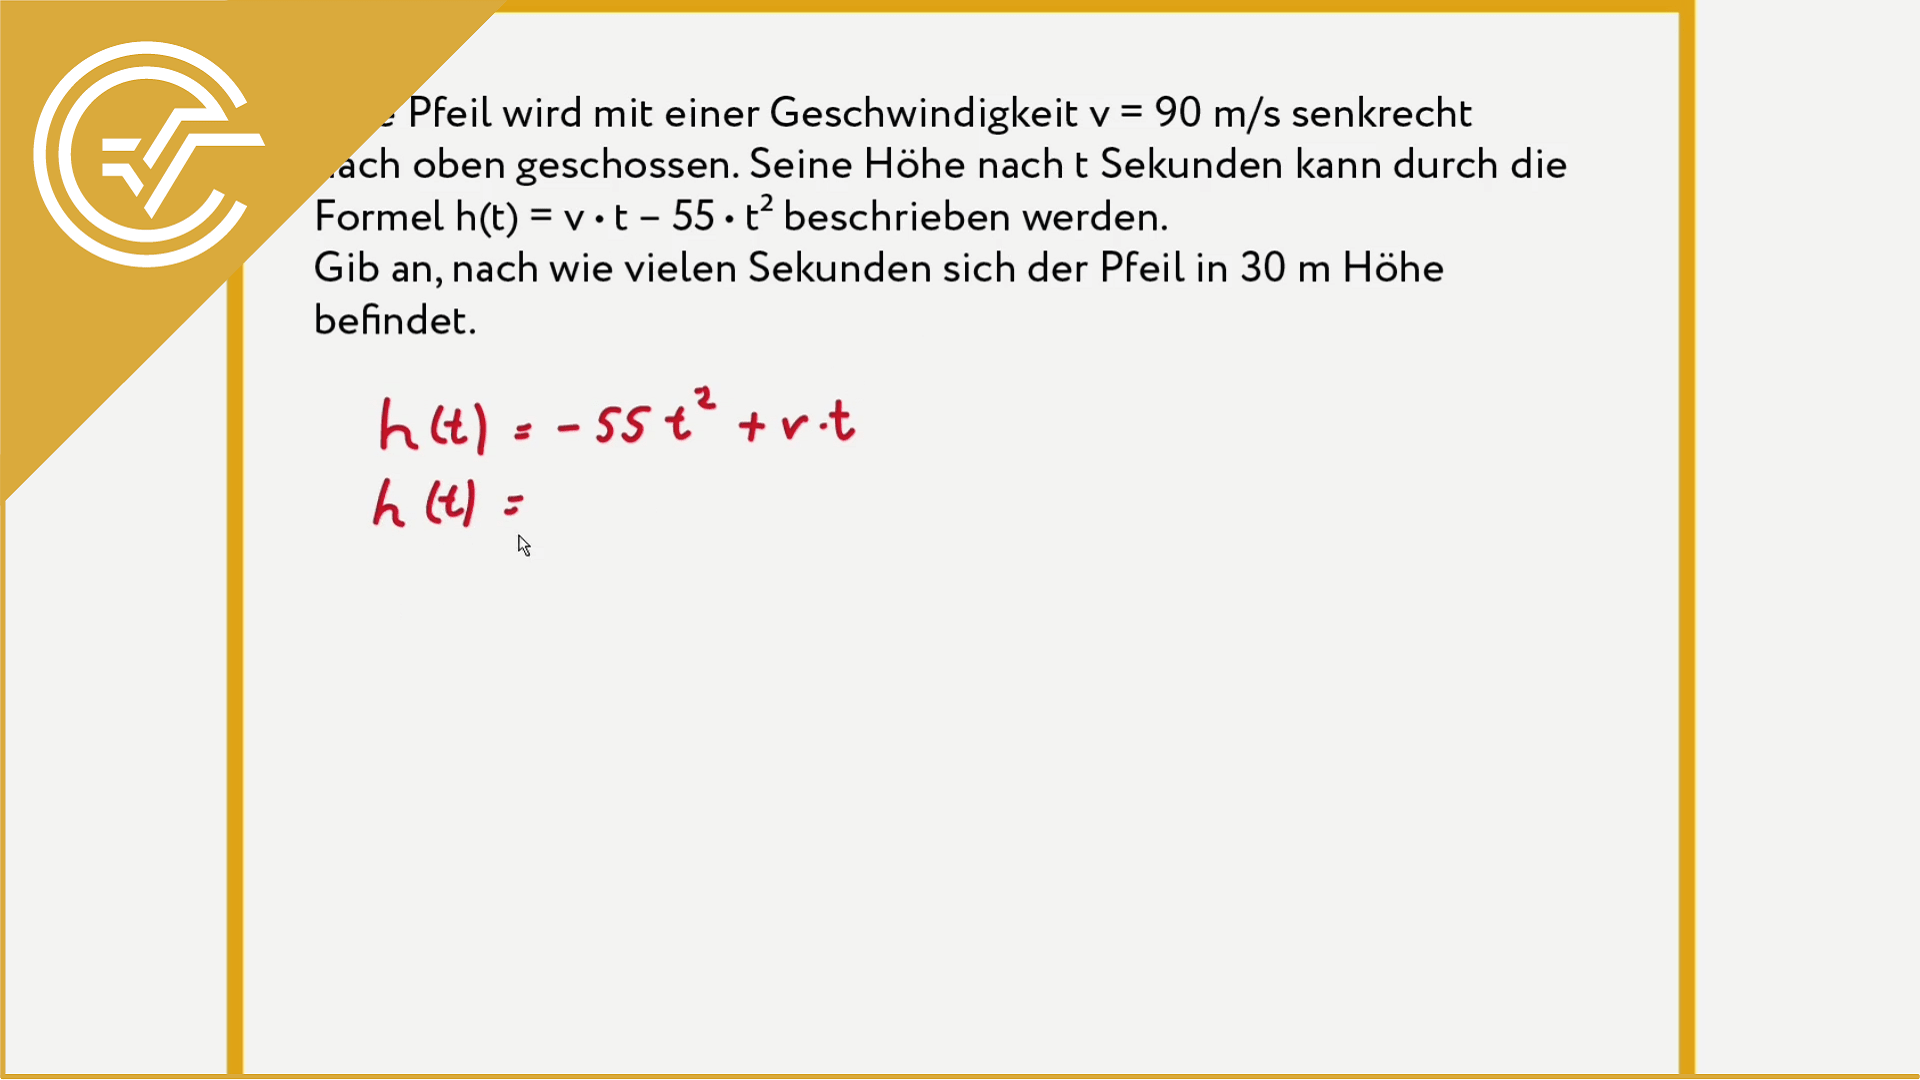 AG 2.3 - Textbeispiel 1